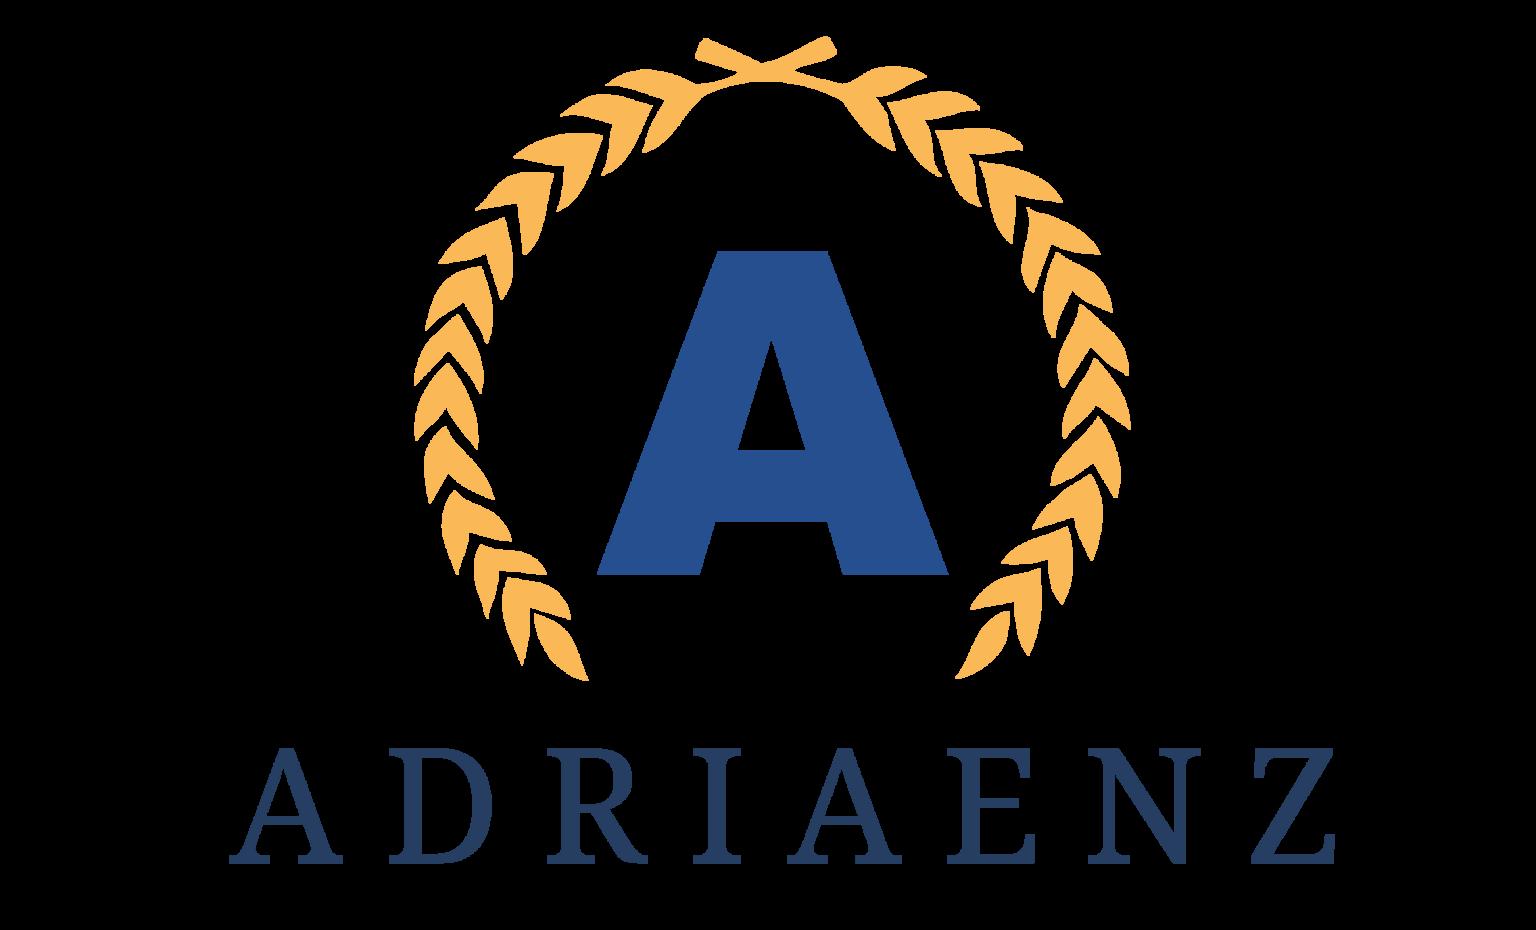 adriaenz logo